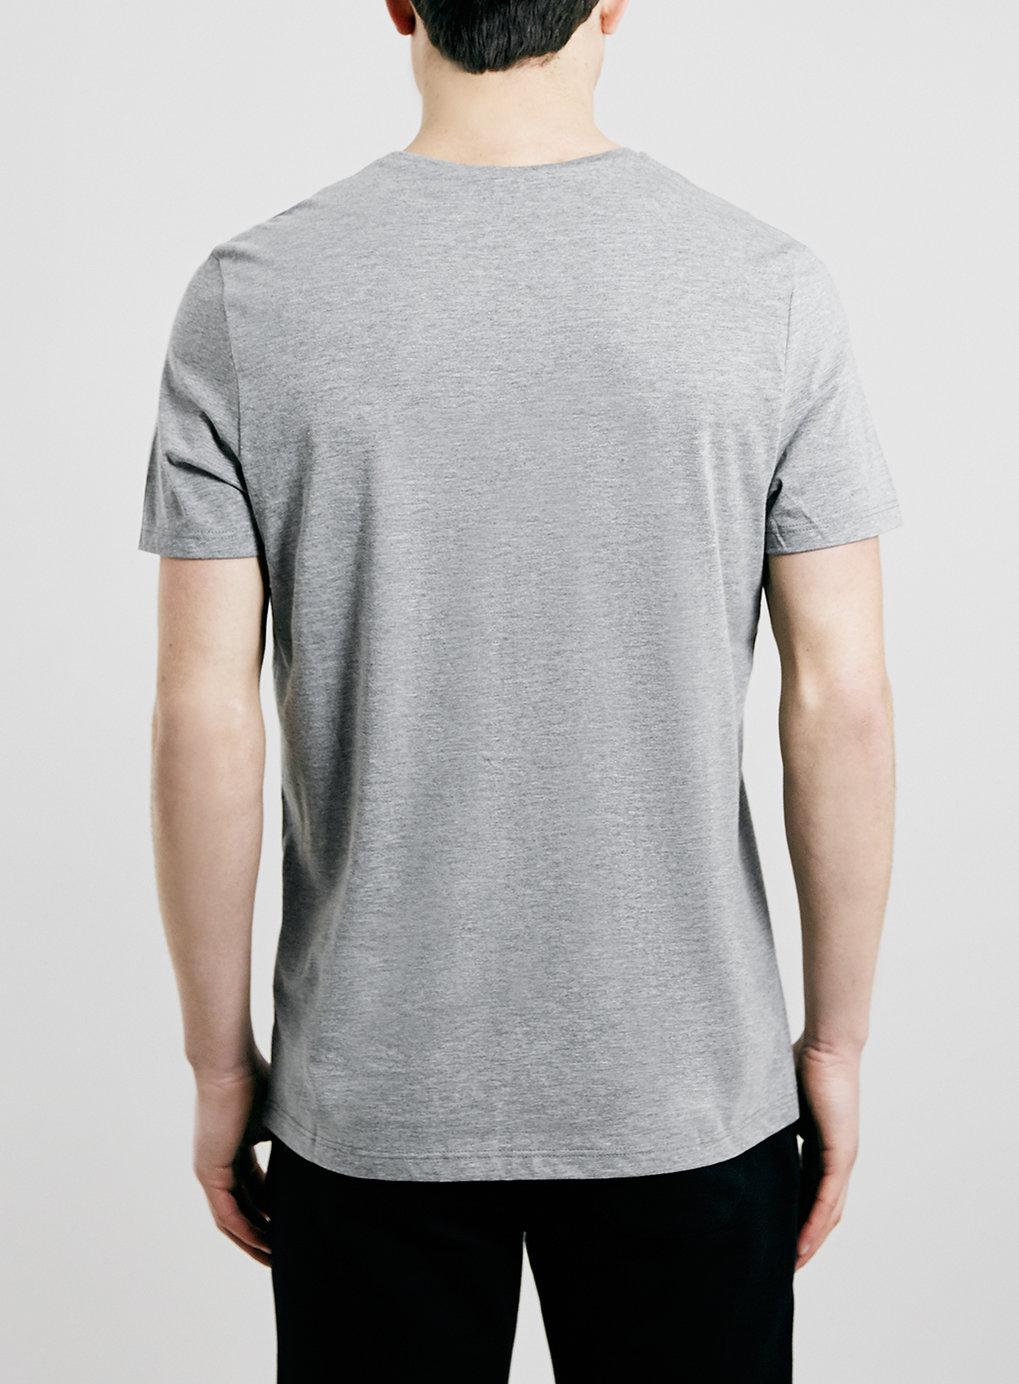 Topman grey marl slim fit t shirt in gray for men mid for Grey marl t shirt